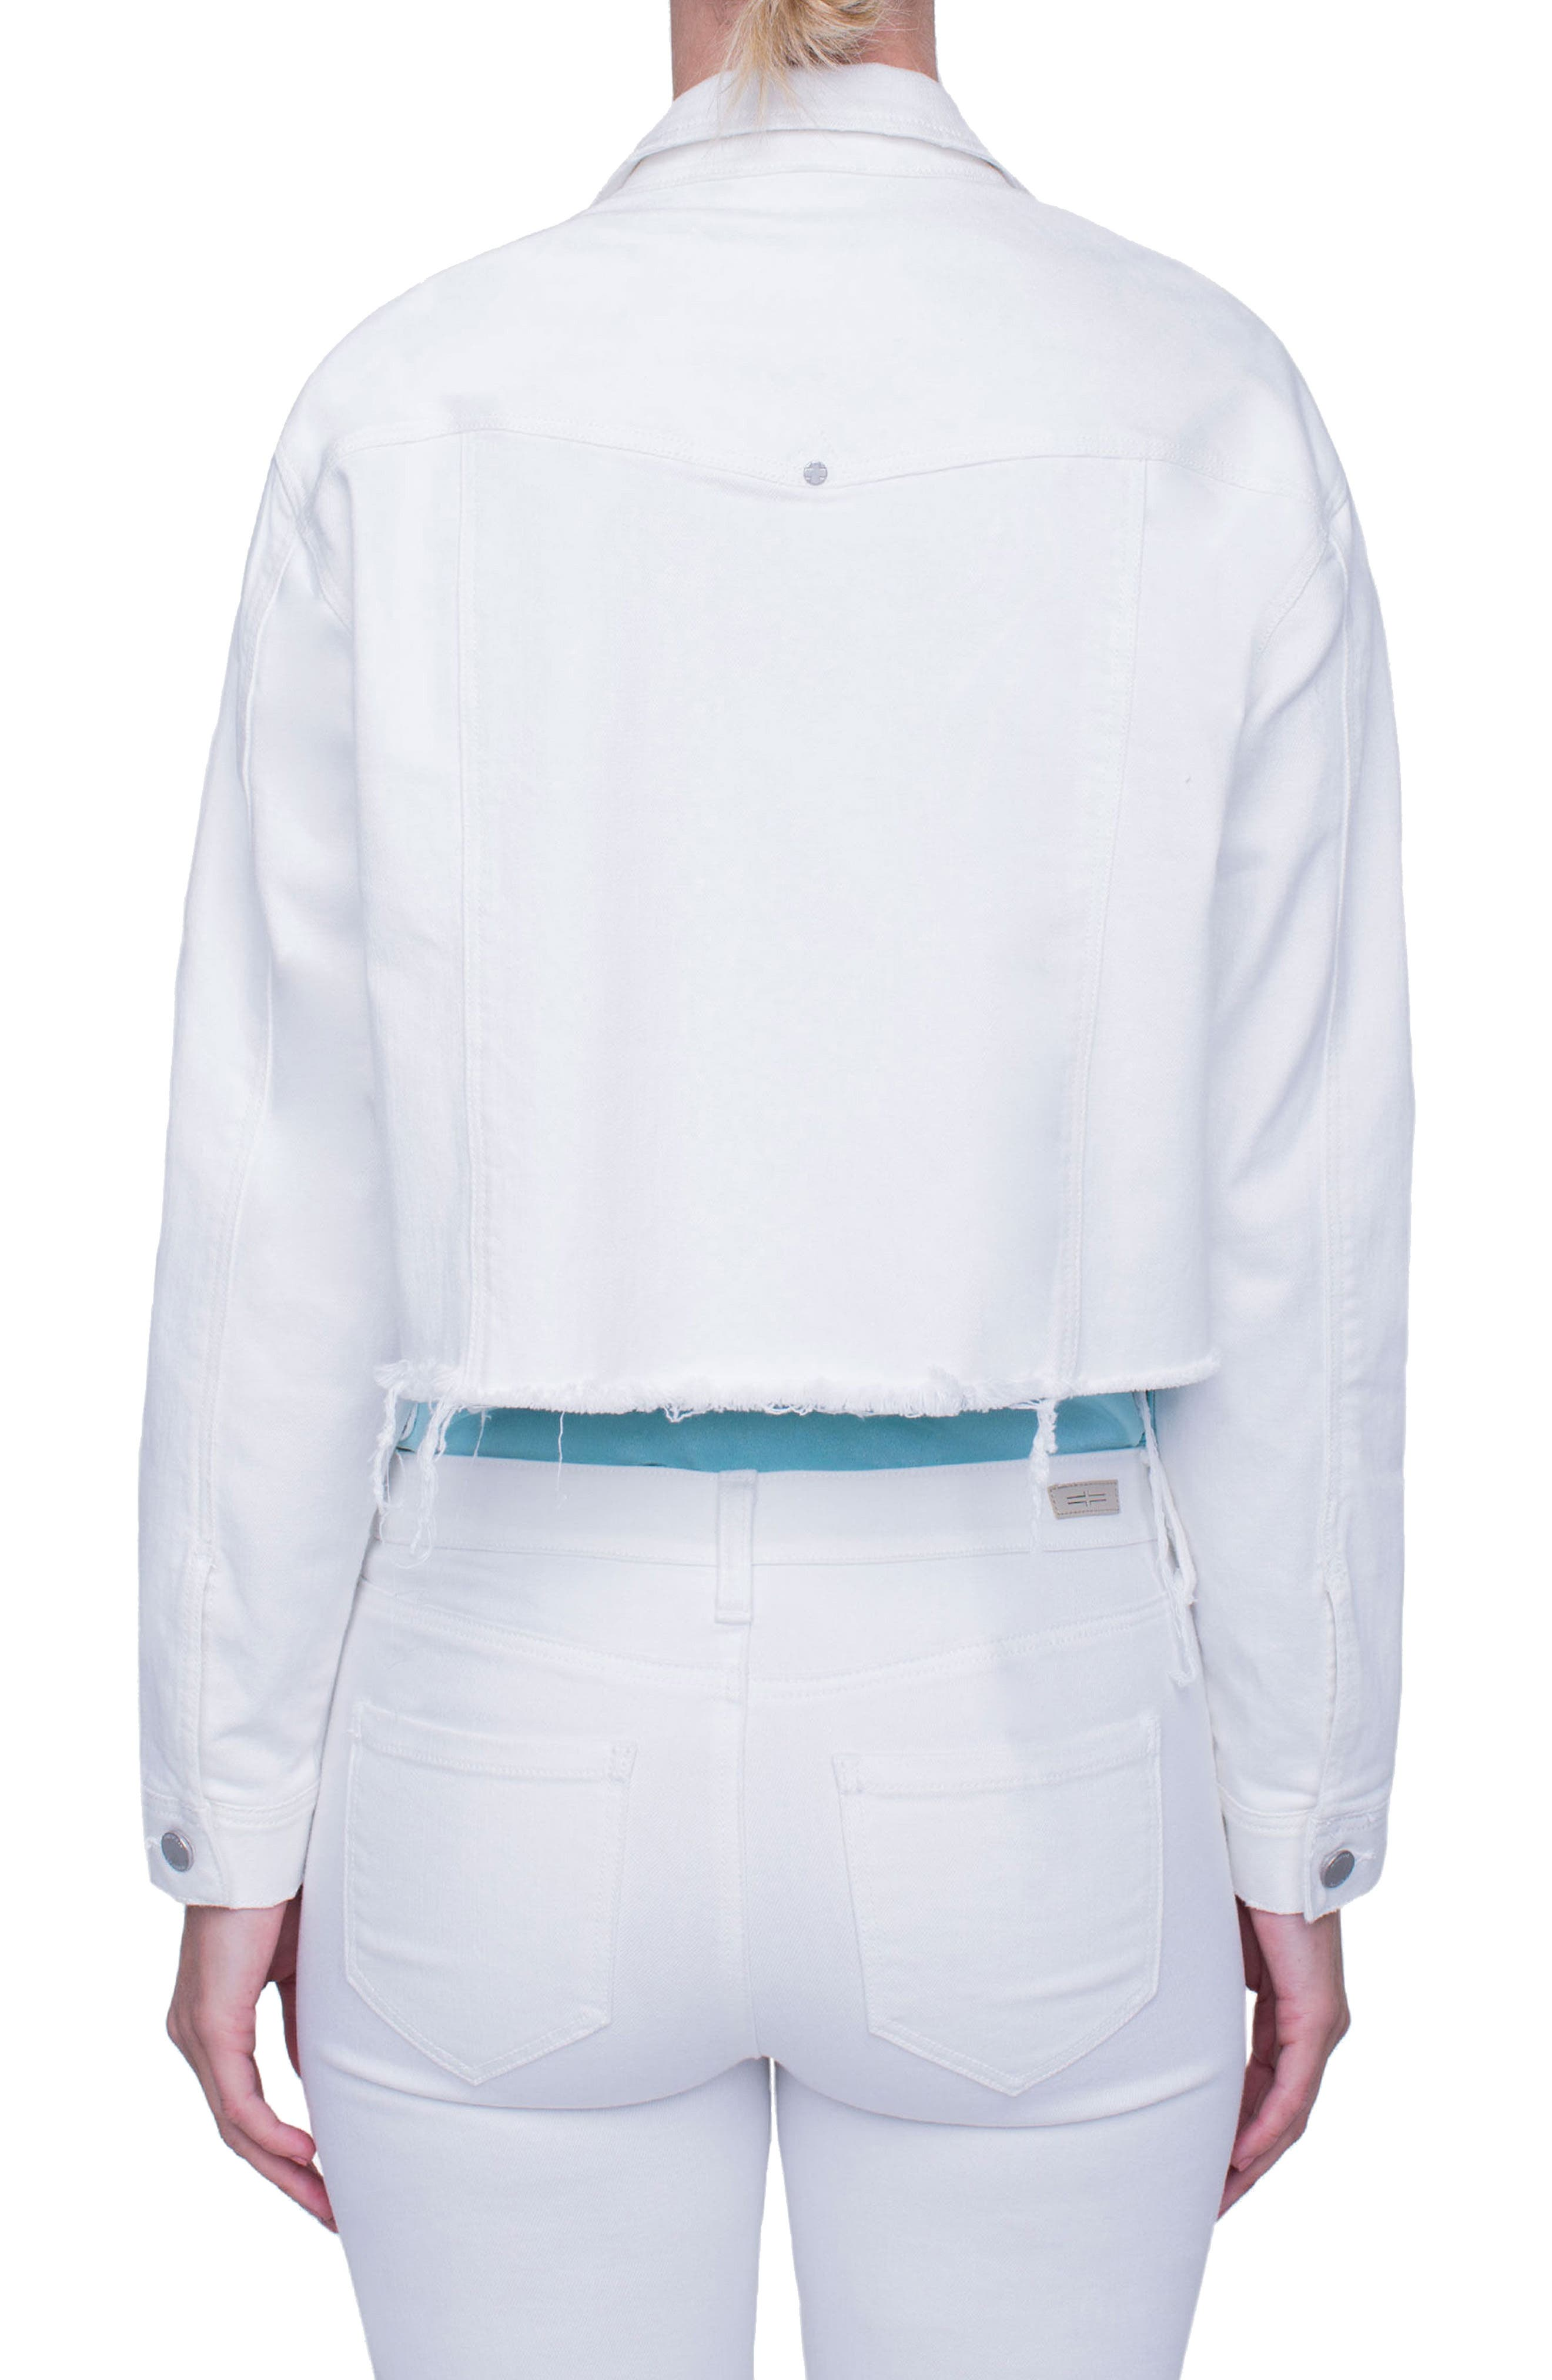 Alternate Image 3  - Liverpool Jeans Company Raw Edge Denim Jacket (Magnolia Destruct)